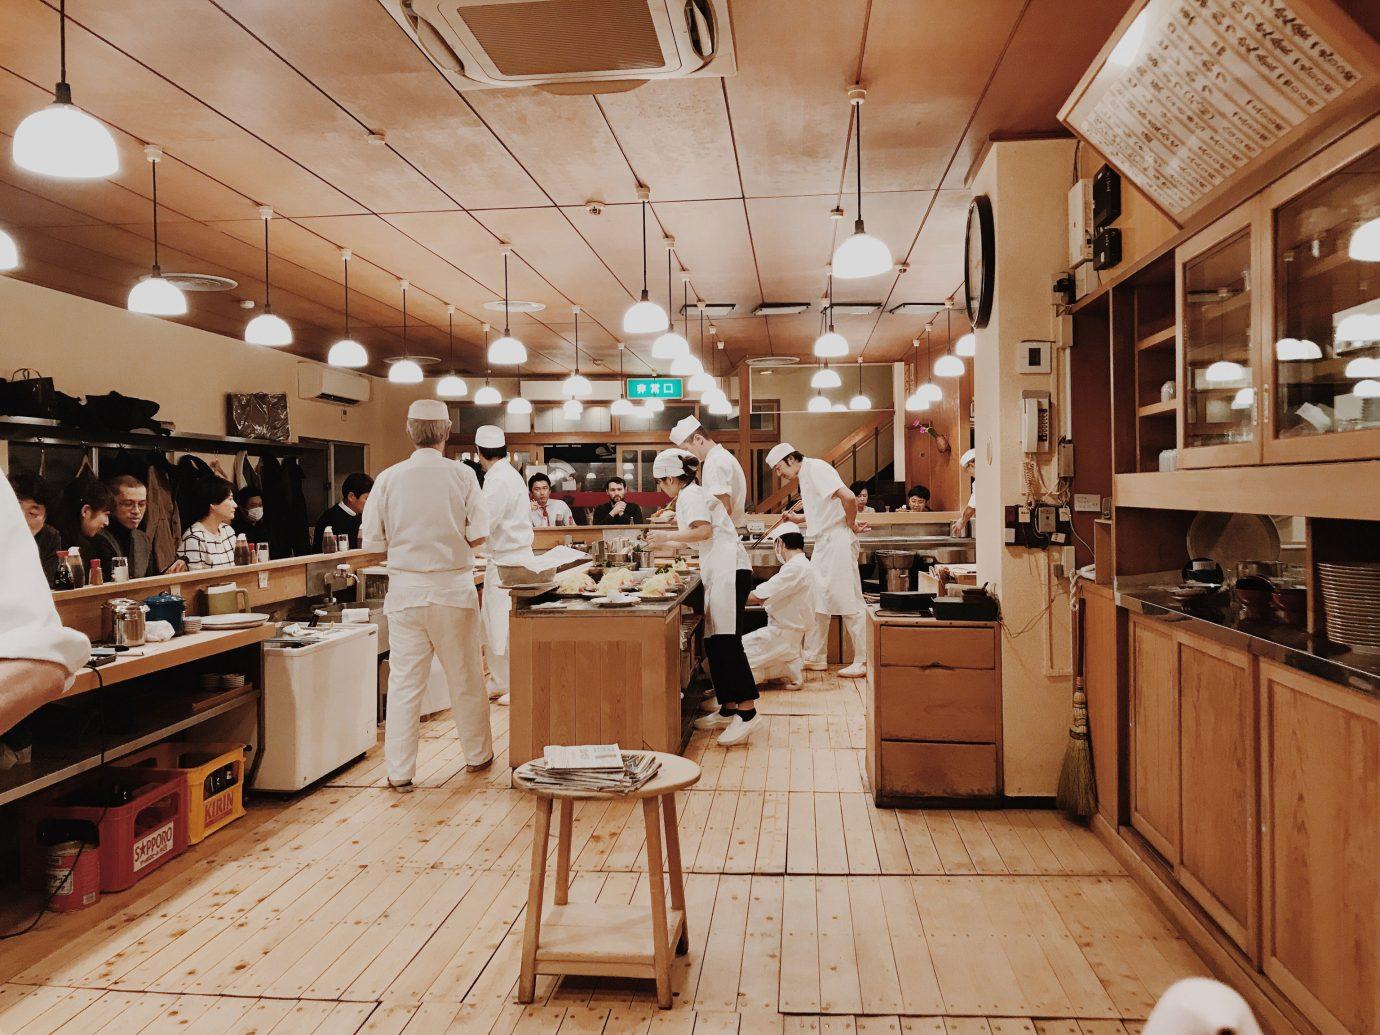 Influencers + Tastemakers Japan Photo Diary Tokyo indoor floor interior design ceiling café restaurant furniture